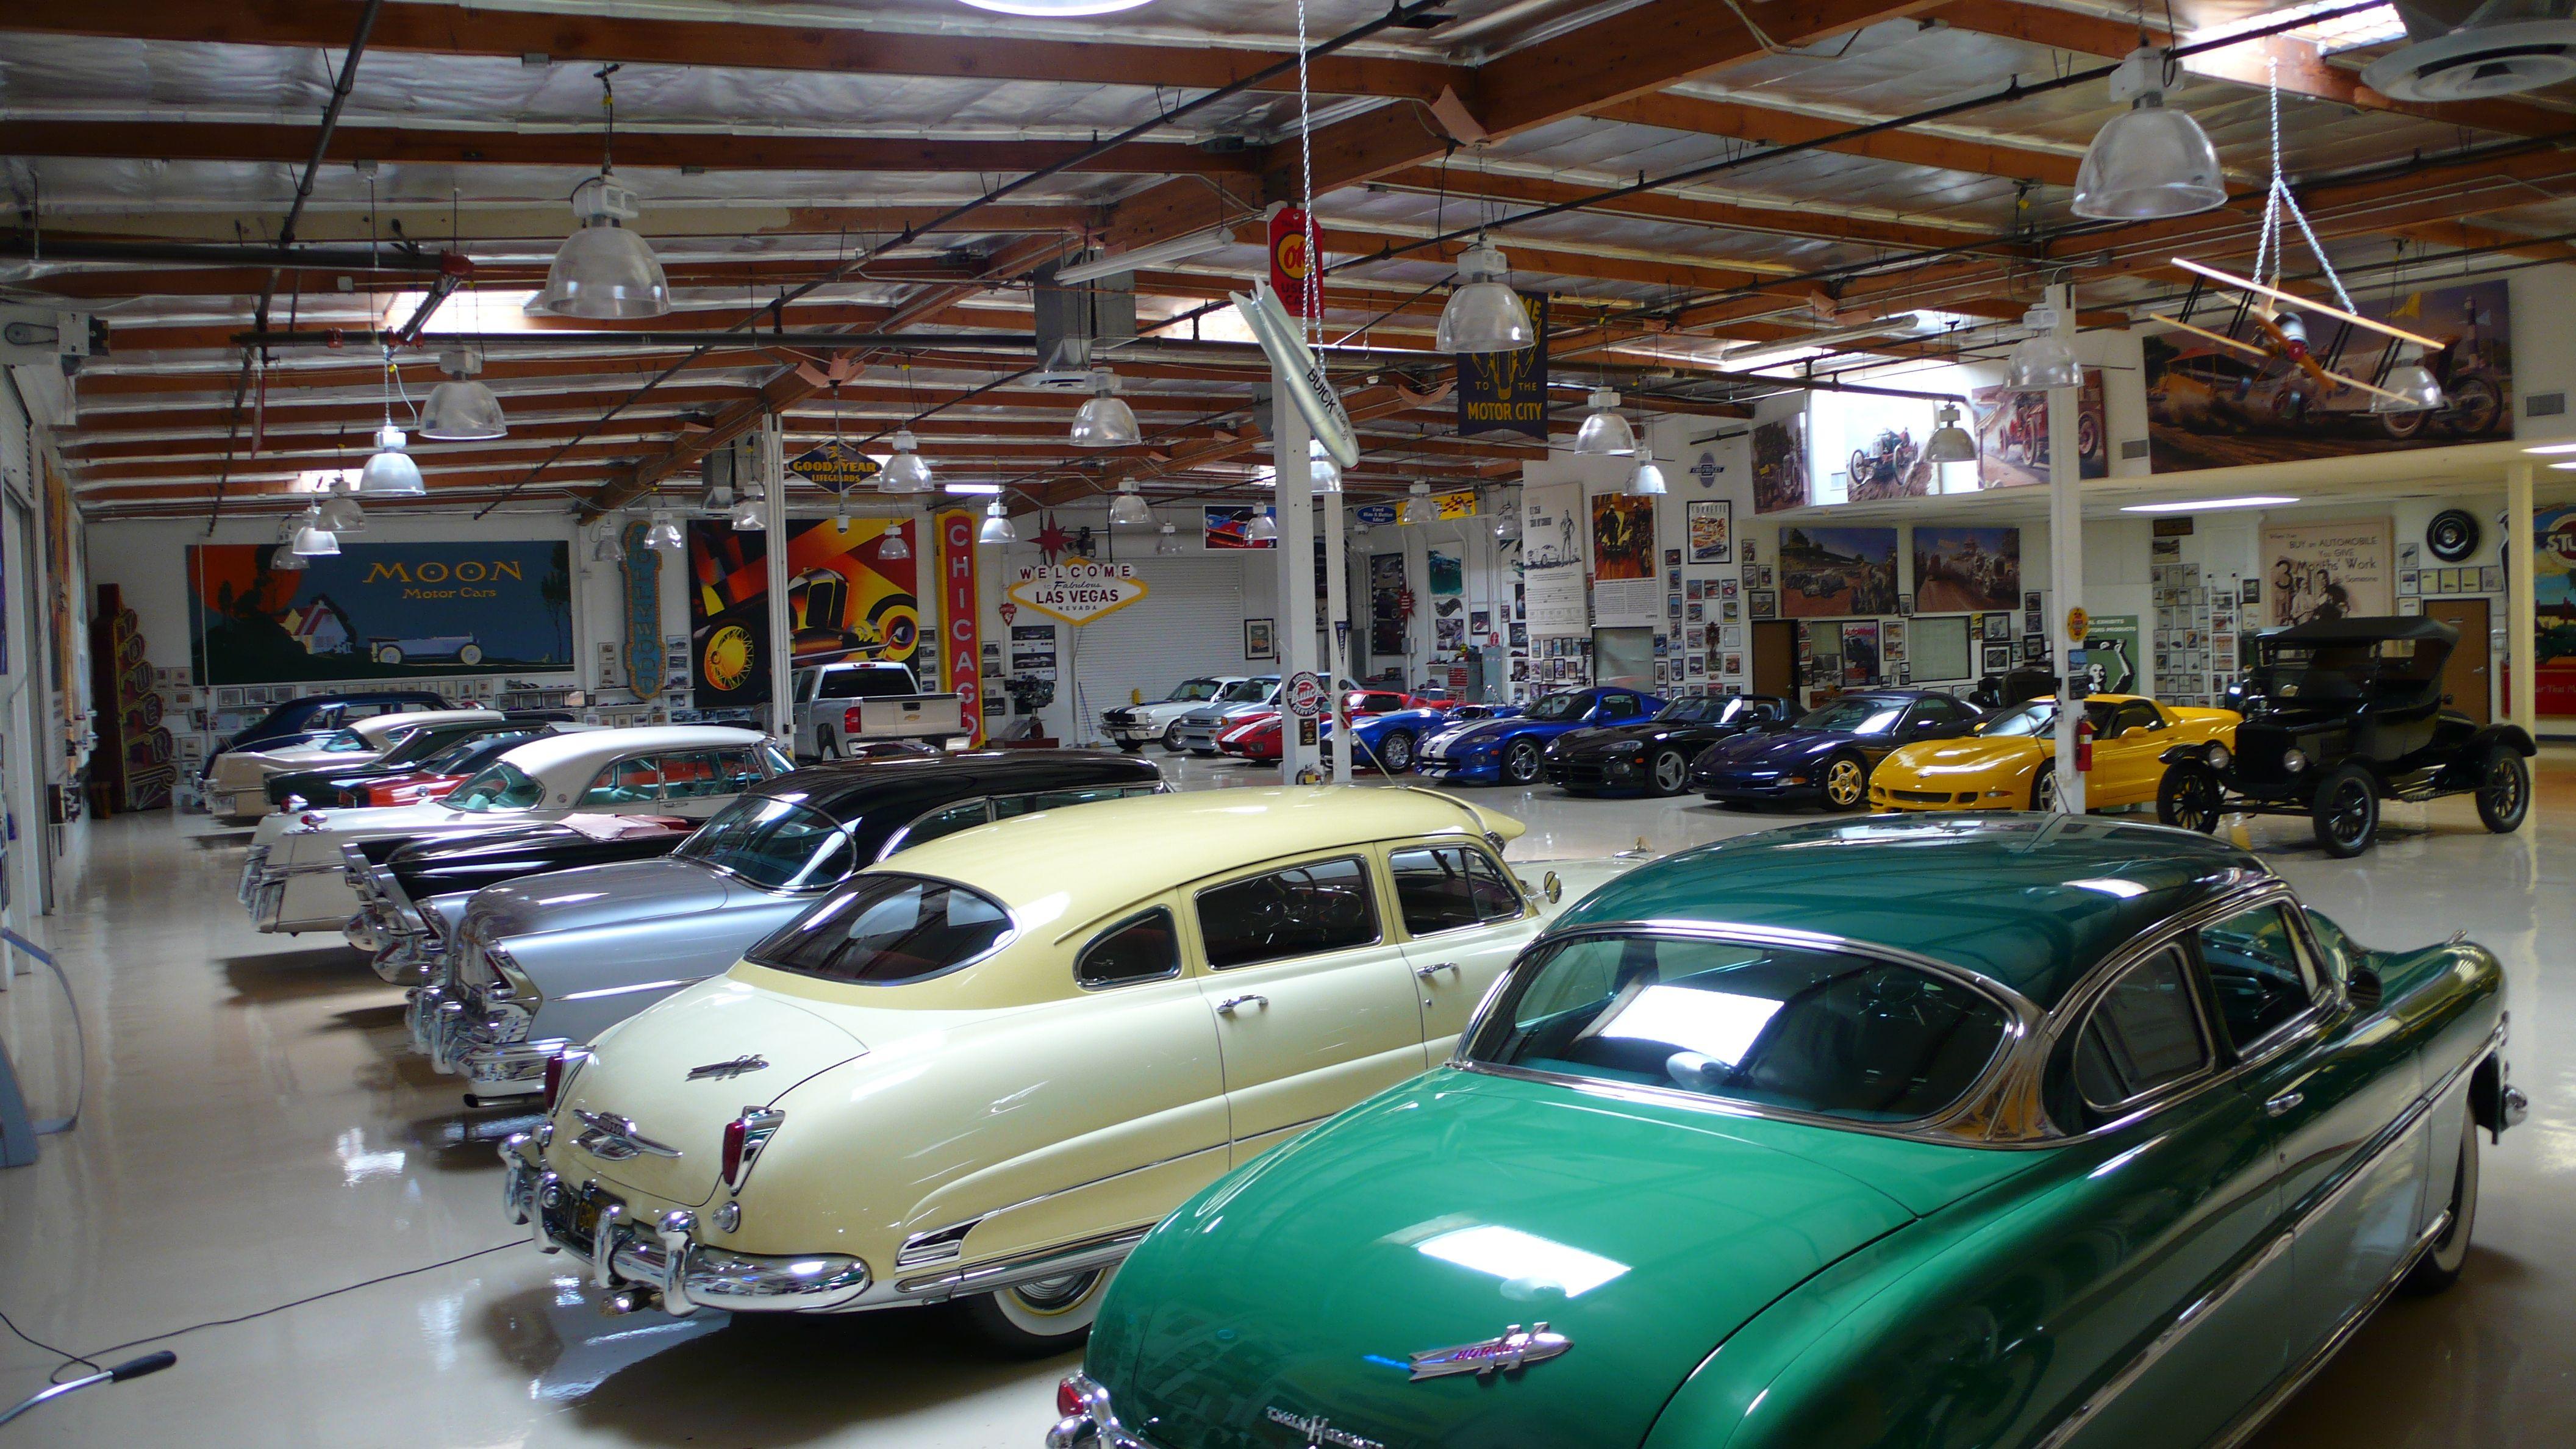 Jay lenos garage locations jay leno garage show elsavadorla for Location garage tours